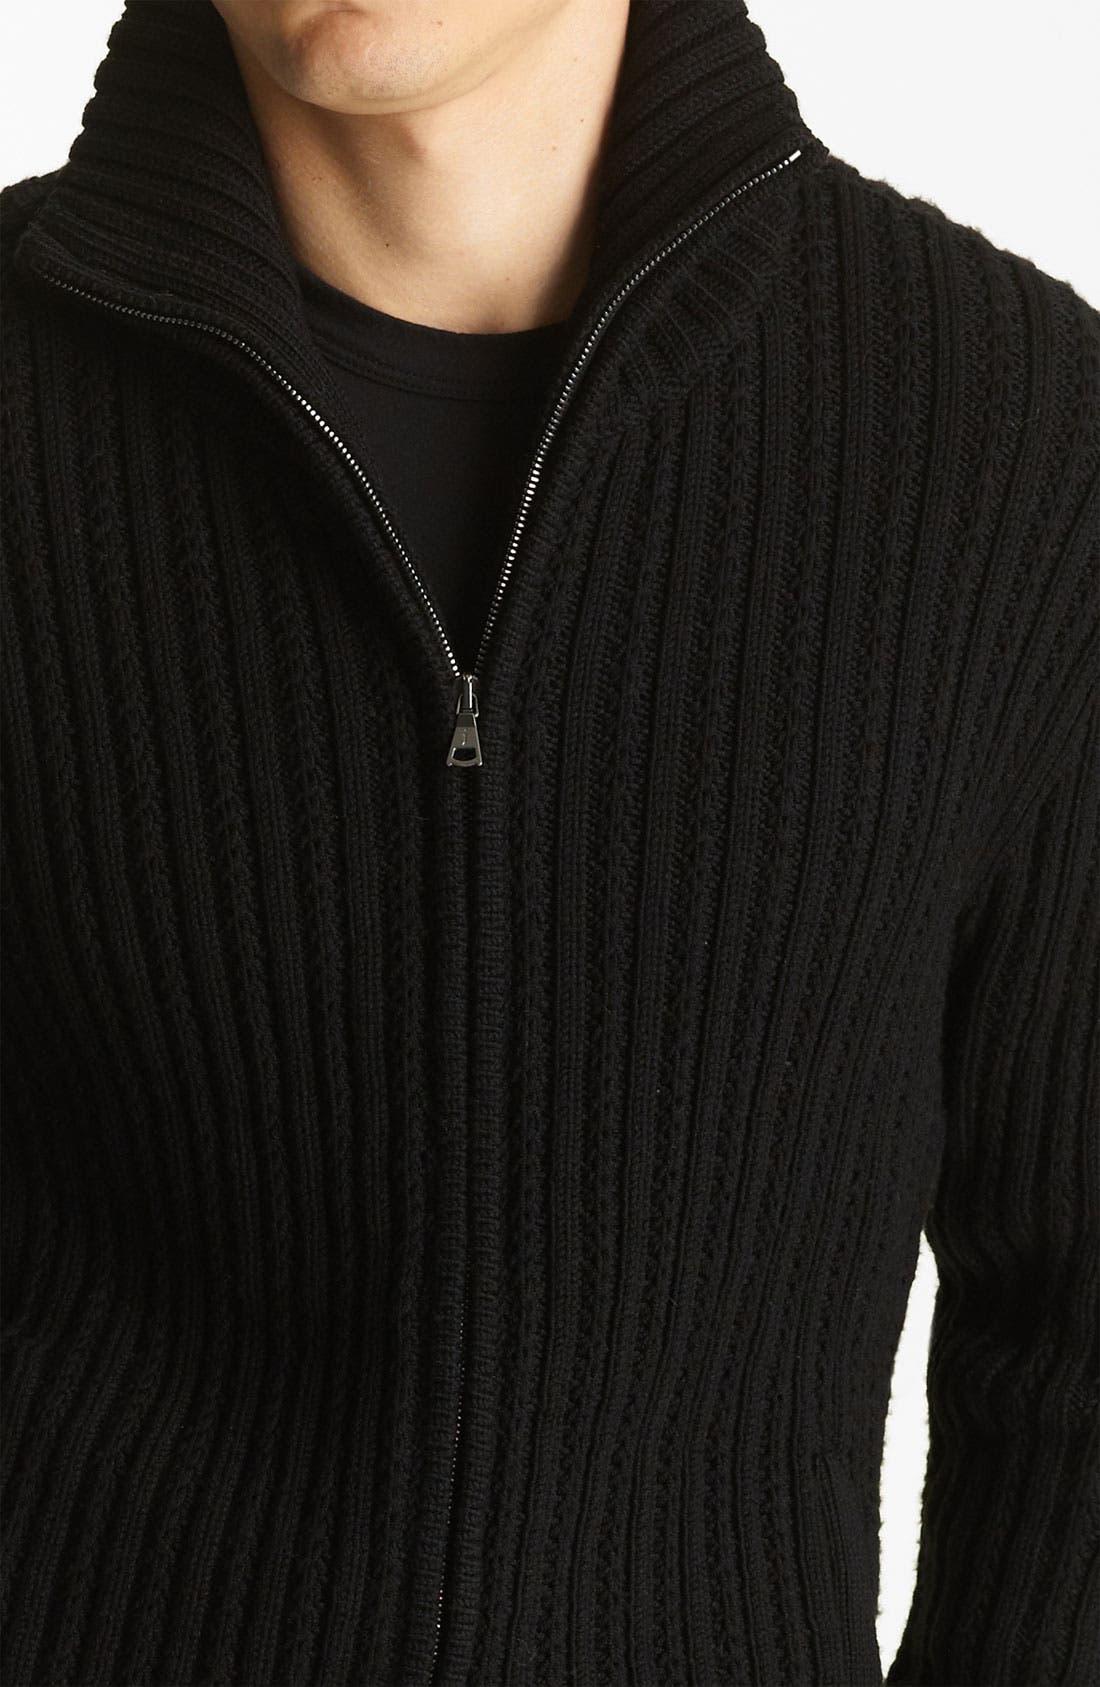 Alternate Image 3  - John Varvatos Collection Zip Knit Sweater